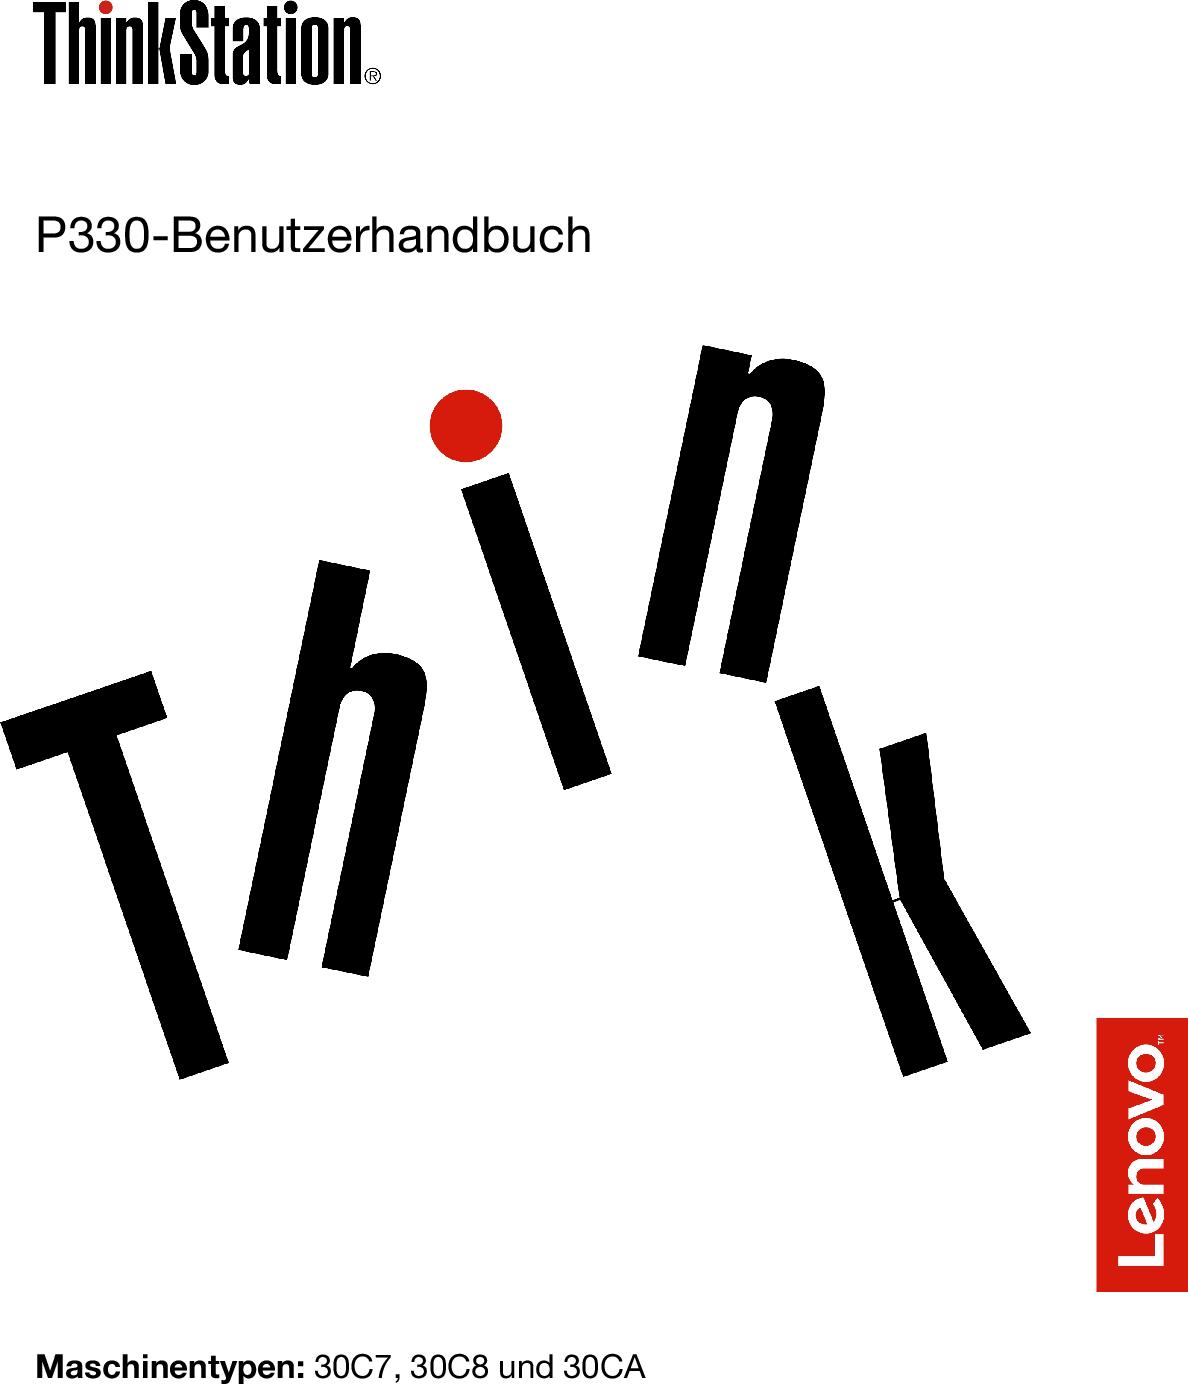 Lenovo P330 Benutzerhandbuch (German) User Guide (Small